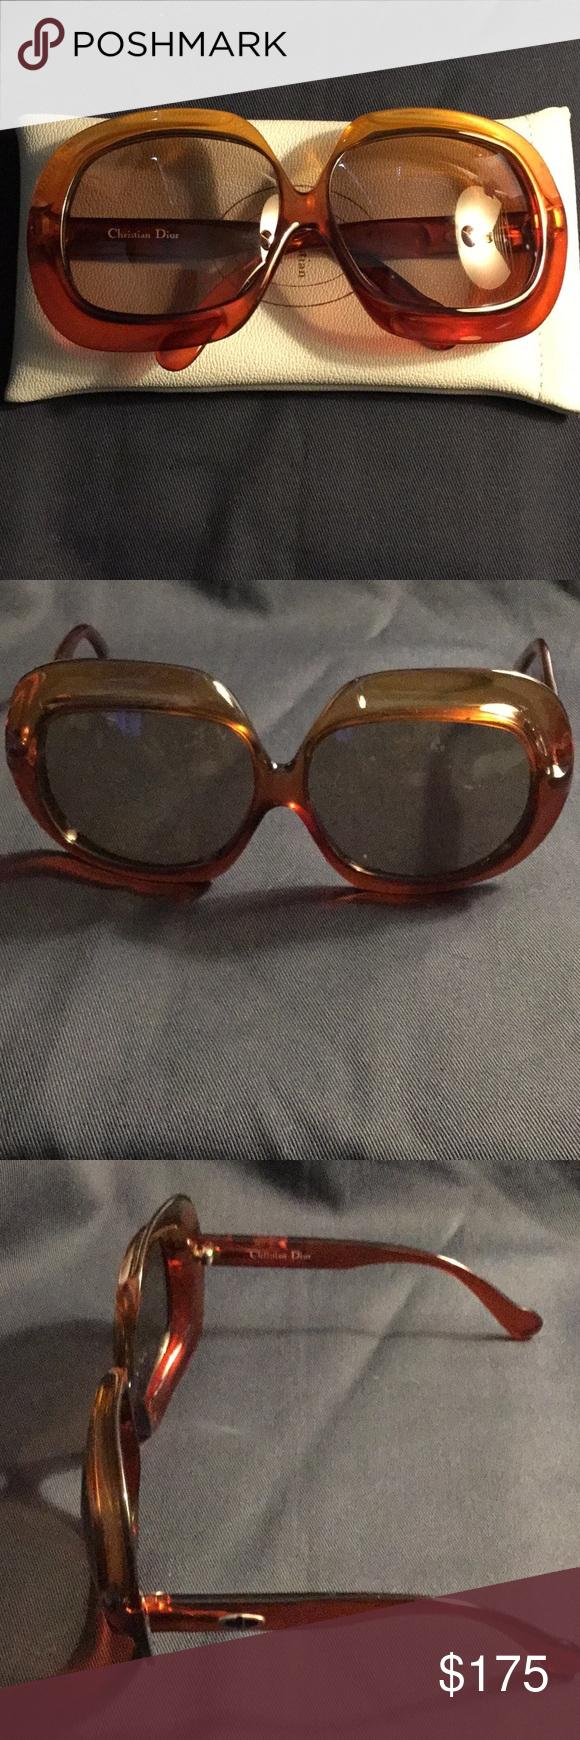 6ef9d3059a1b Vintage Christian Dior Sunglasses Vintage Christian Dior Sunglasses ...